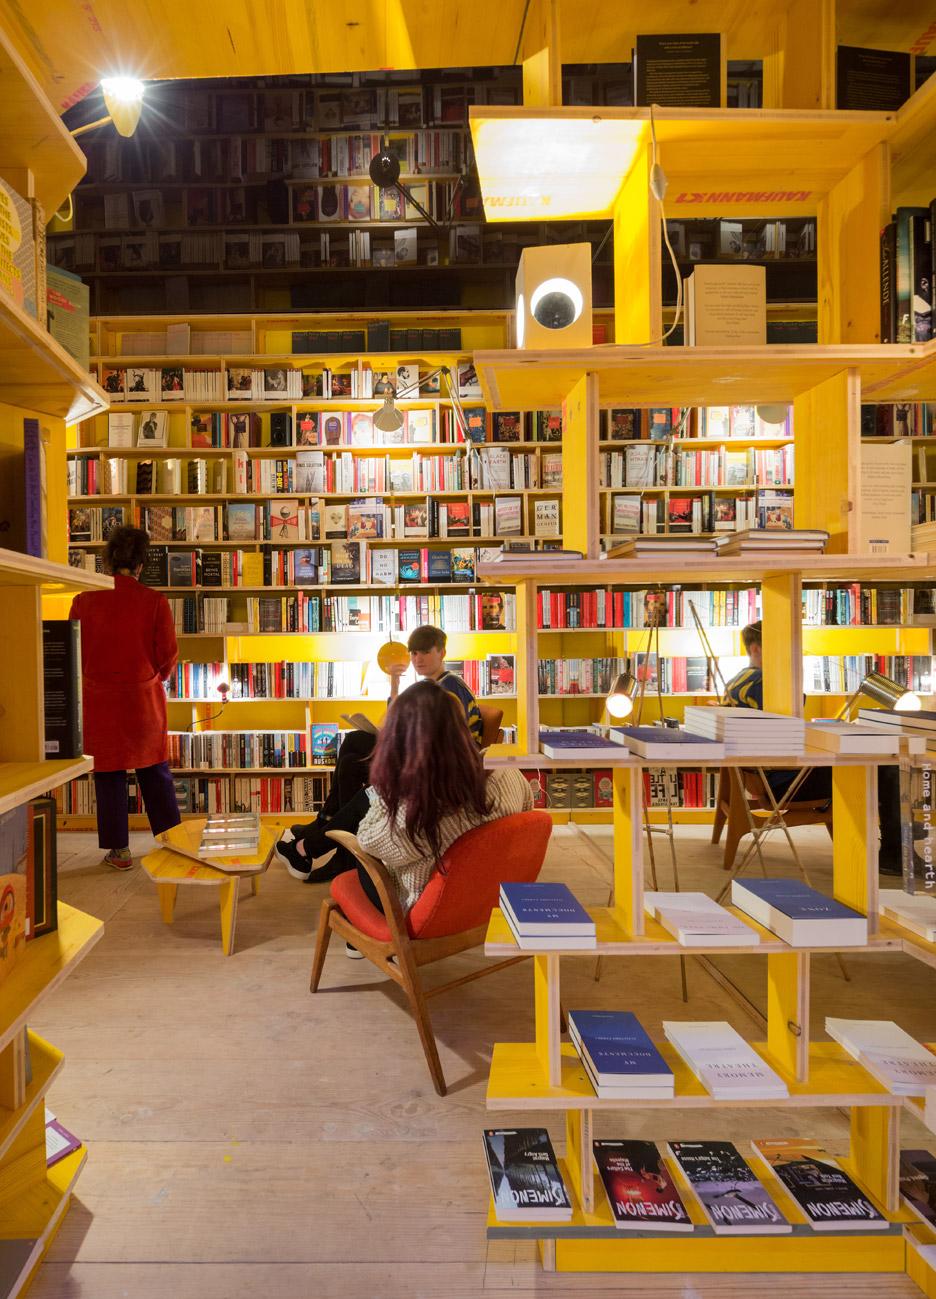 Libreria by SelgasCano